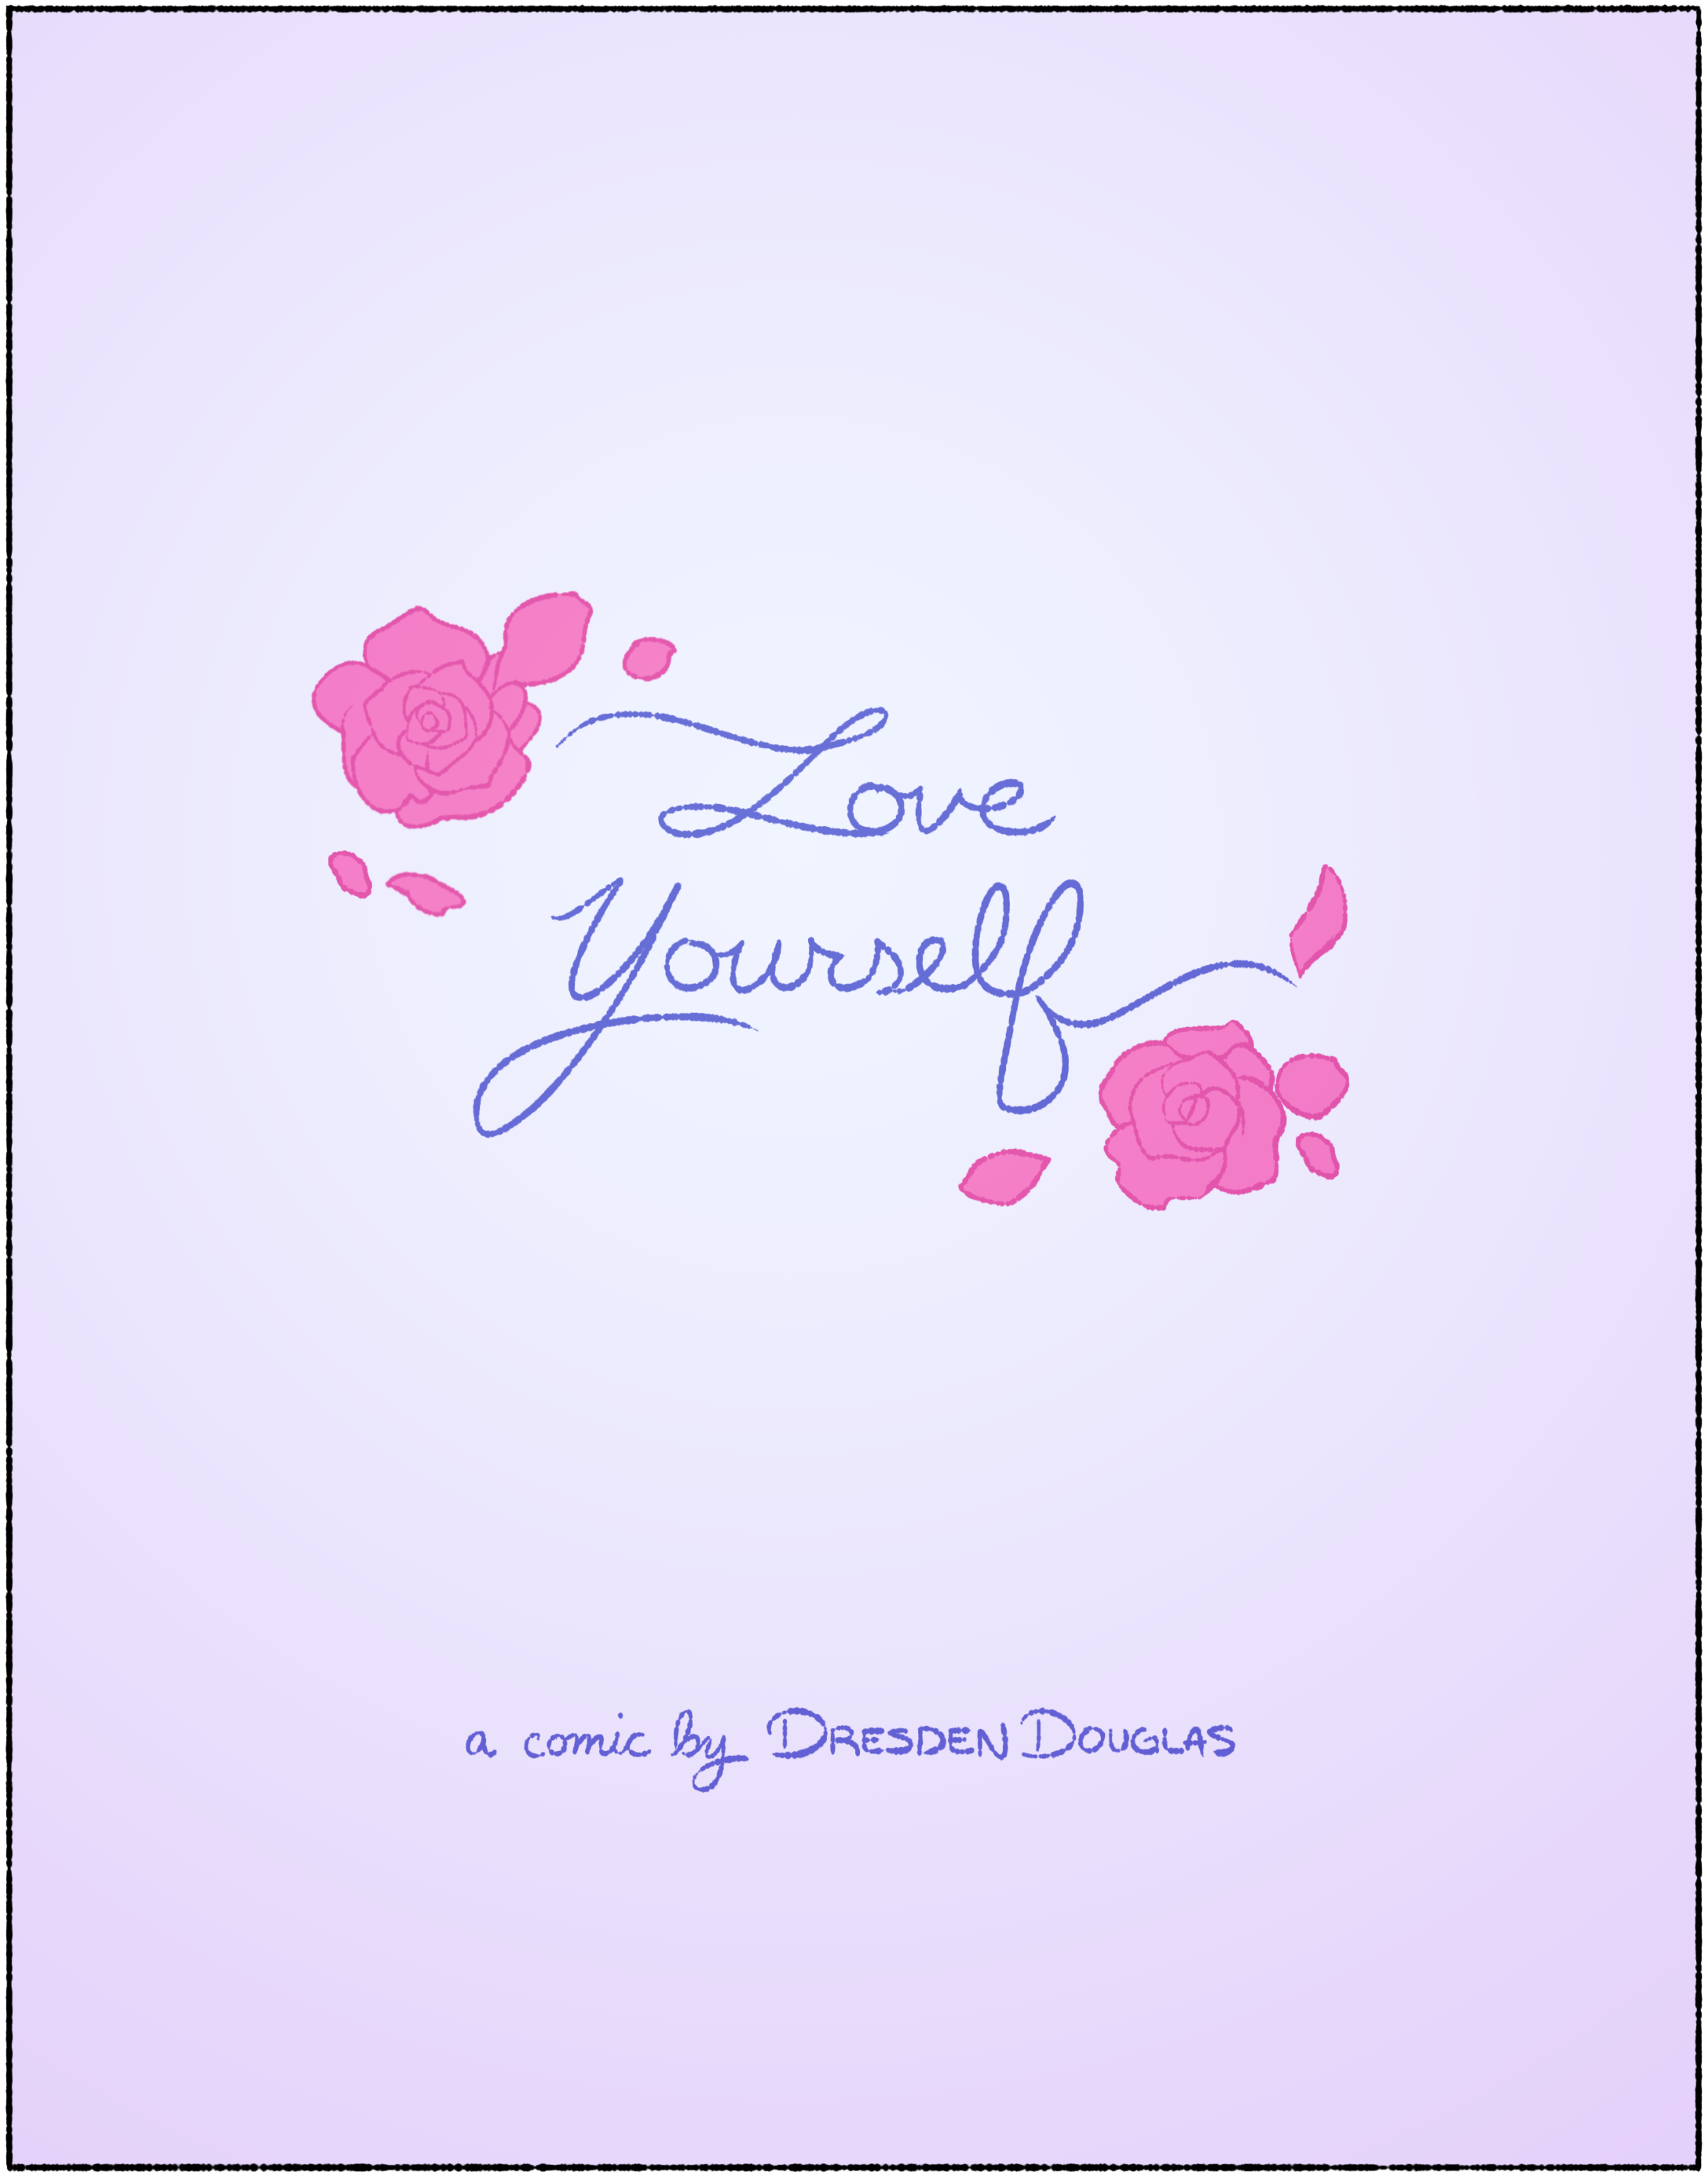 self love0